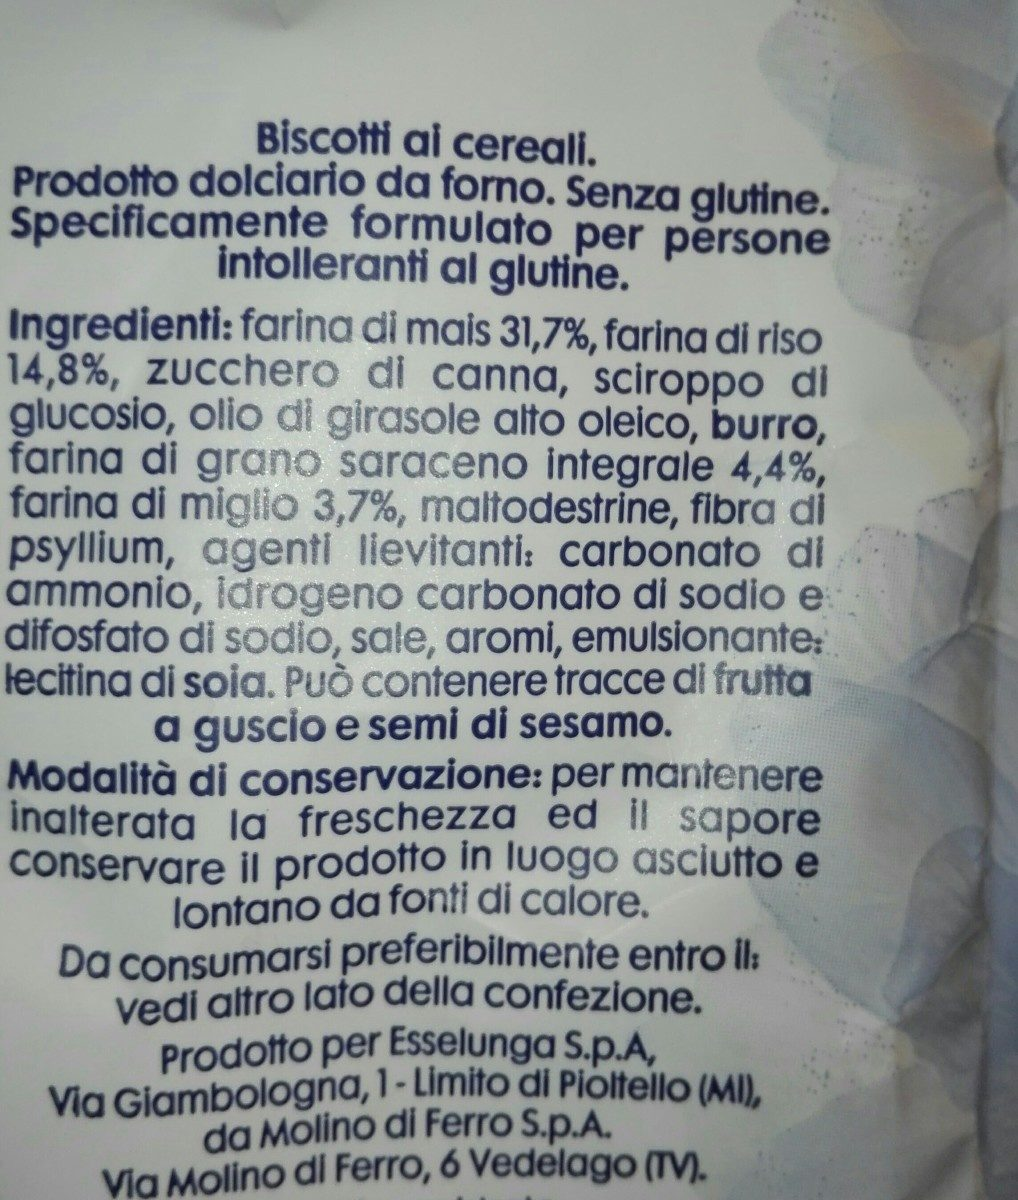 Biscotti senza glutine ai cereali - Ingredienti